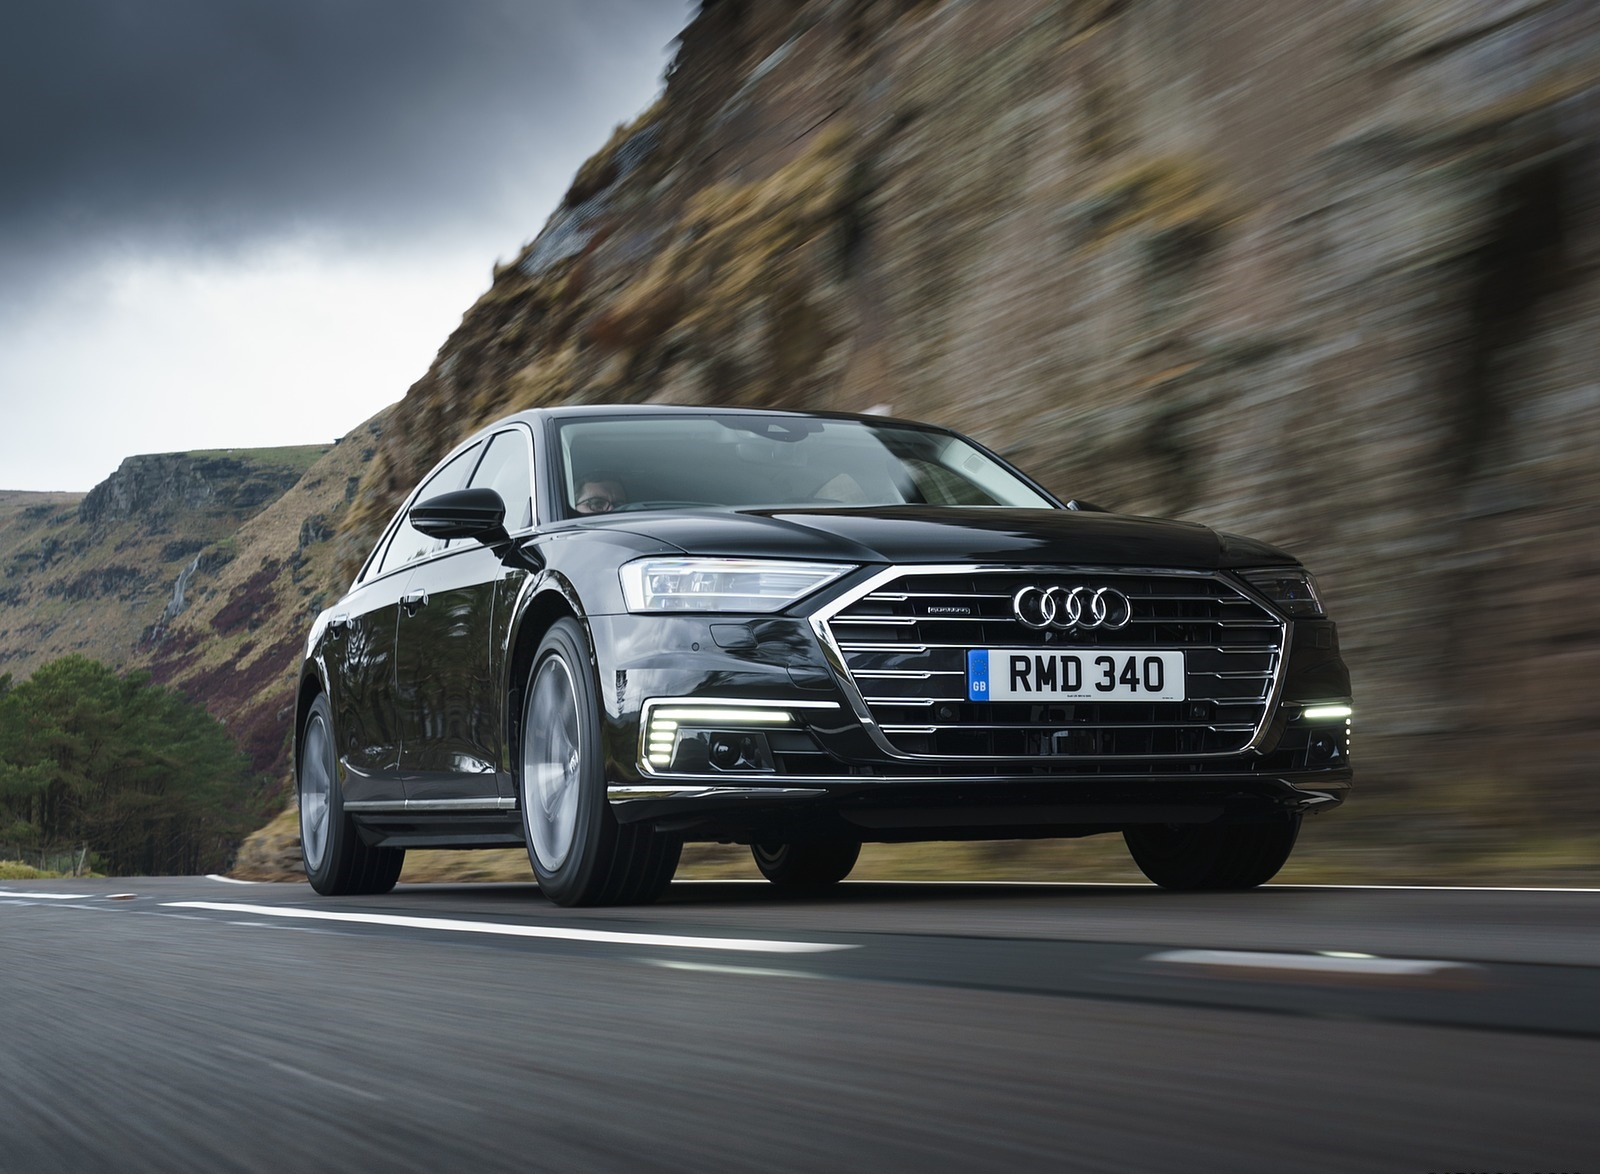 2020 Audi A8 L 60 TFSI e quattro (Plug-In Hybrid UK-Spec) Front Three-Quarter Wallpapers (5)